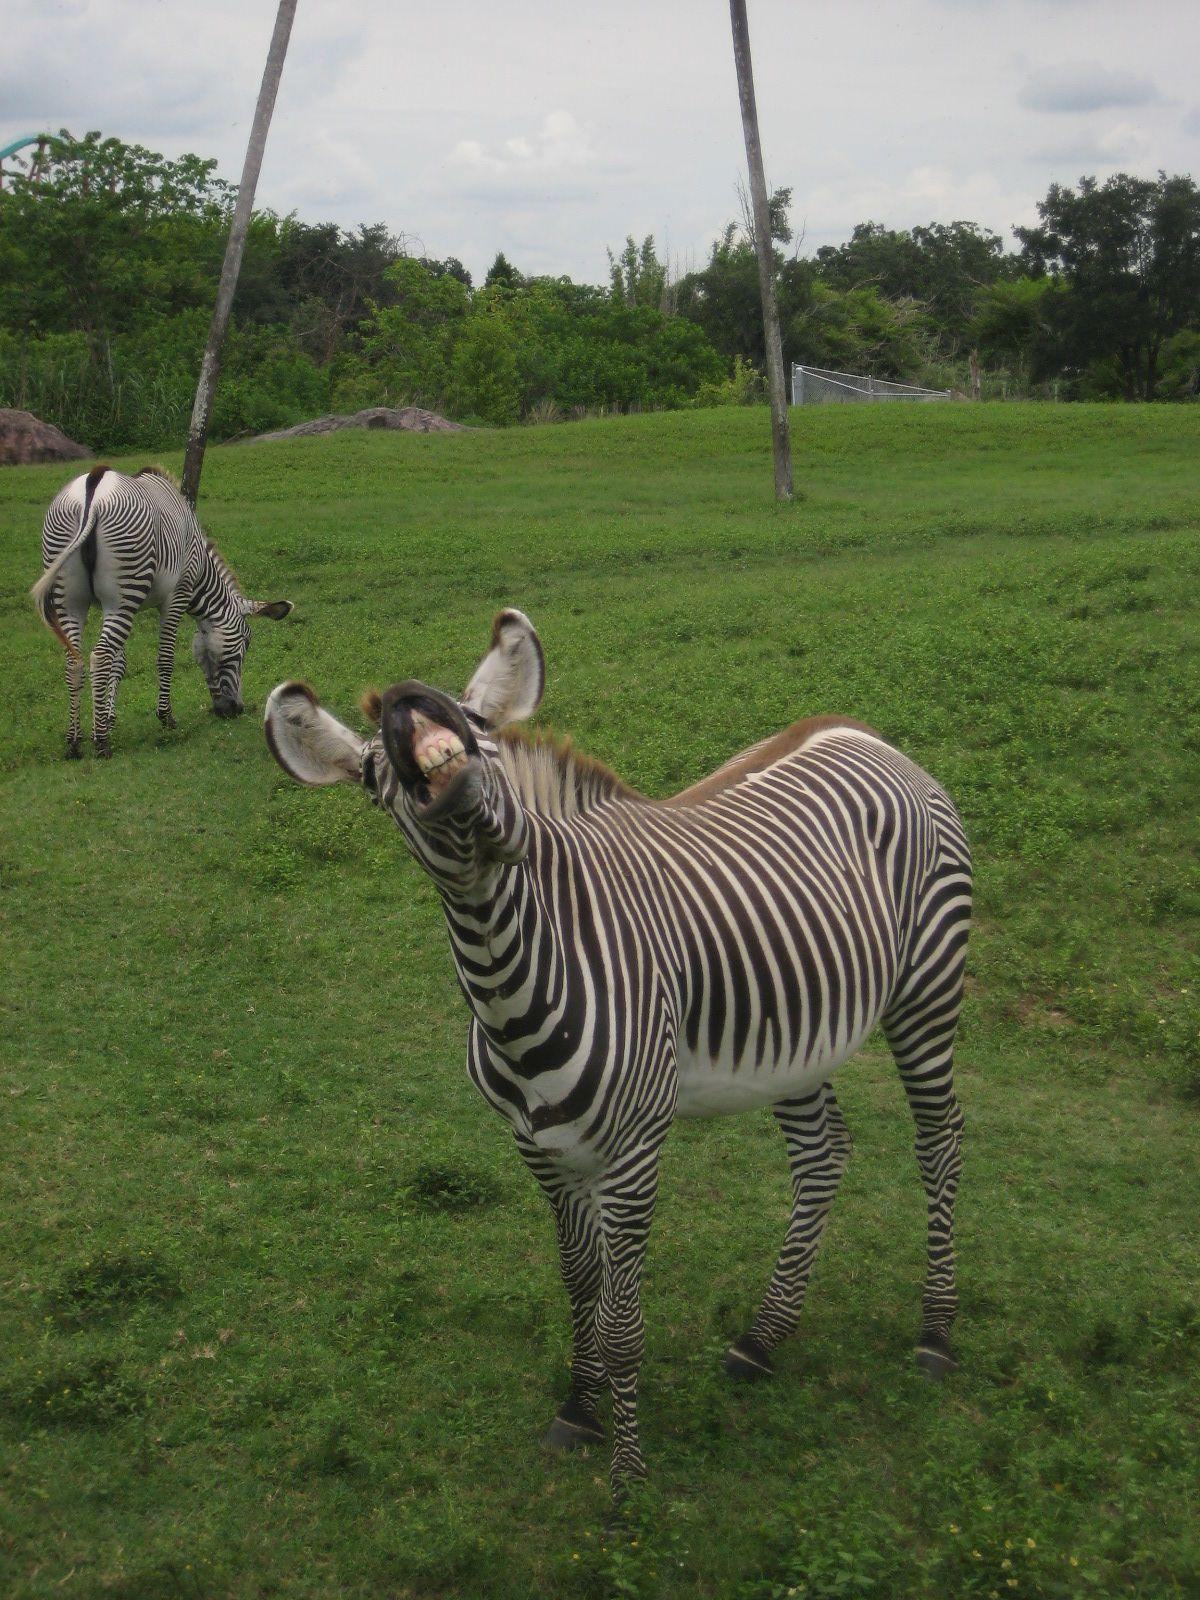 crazy zebra | Zebra crazy Grandma | Pinterest